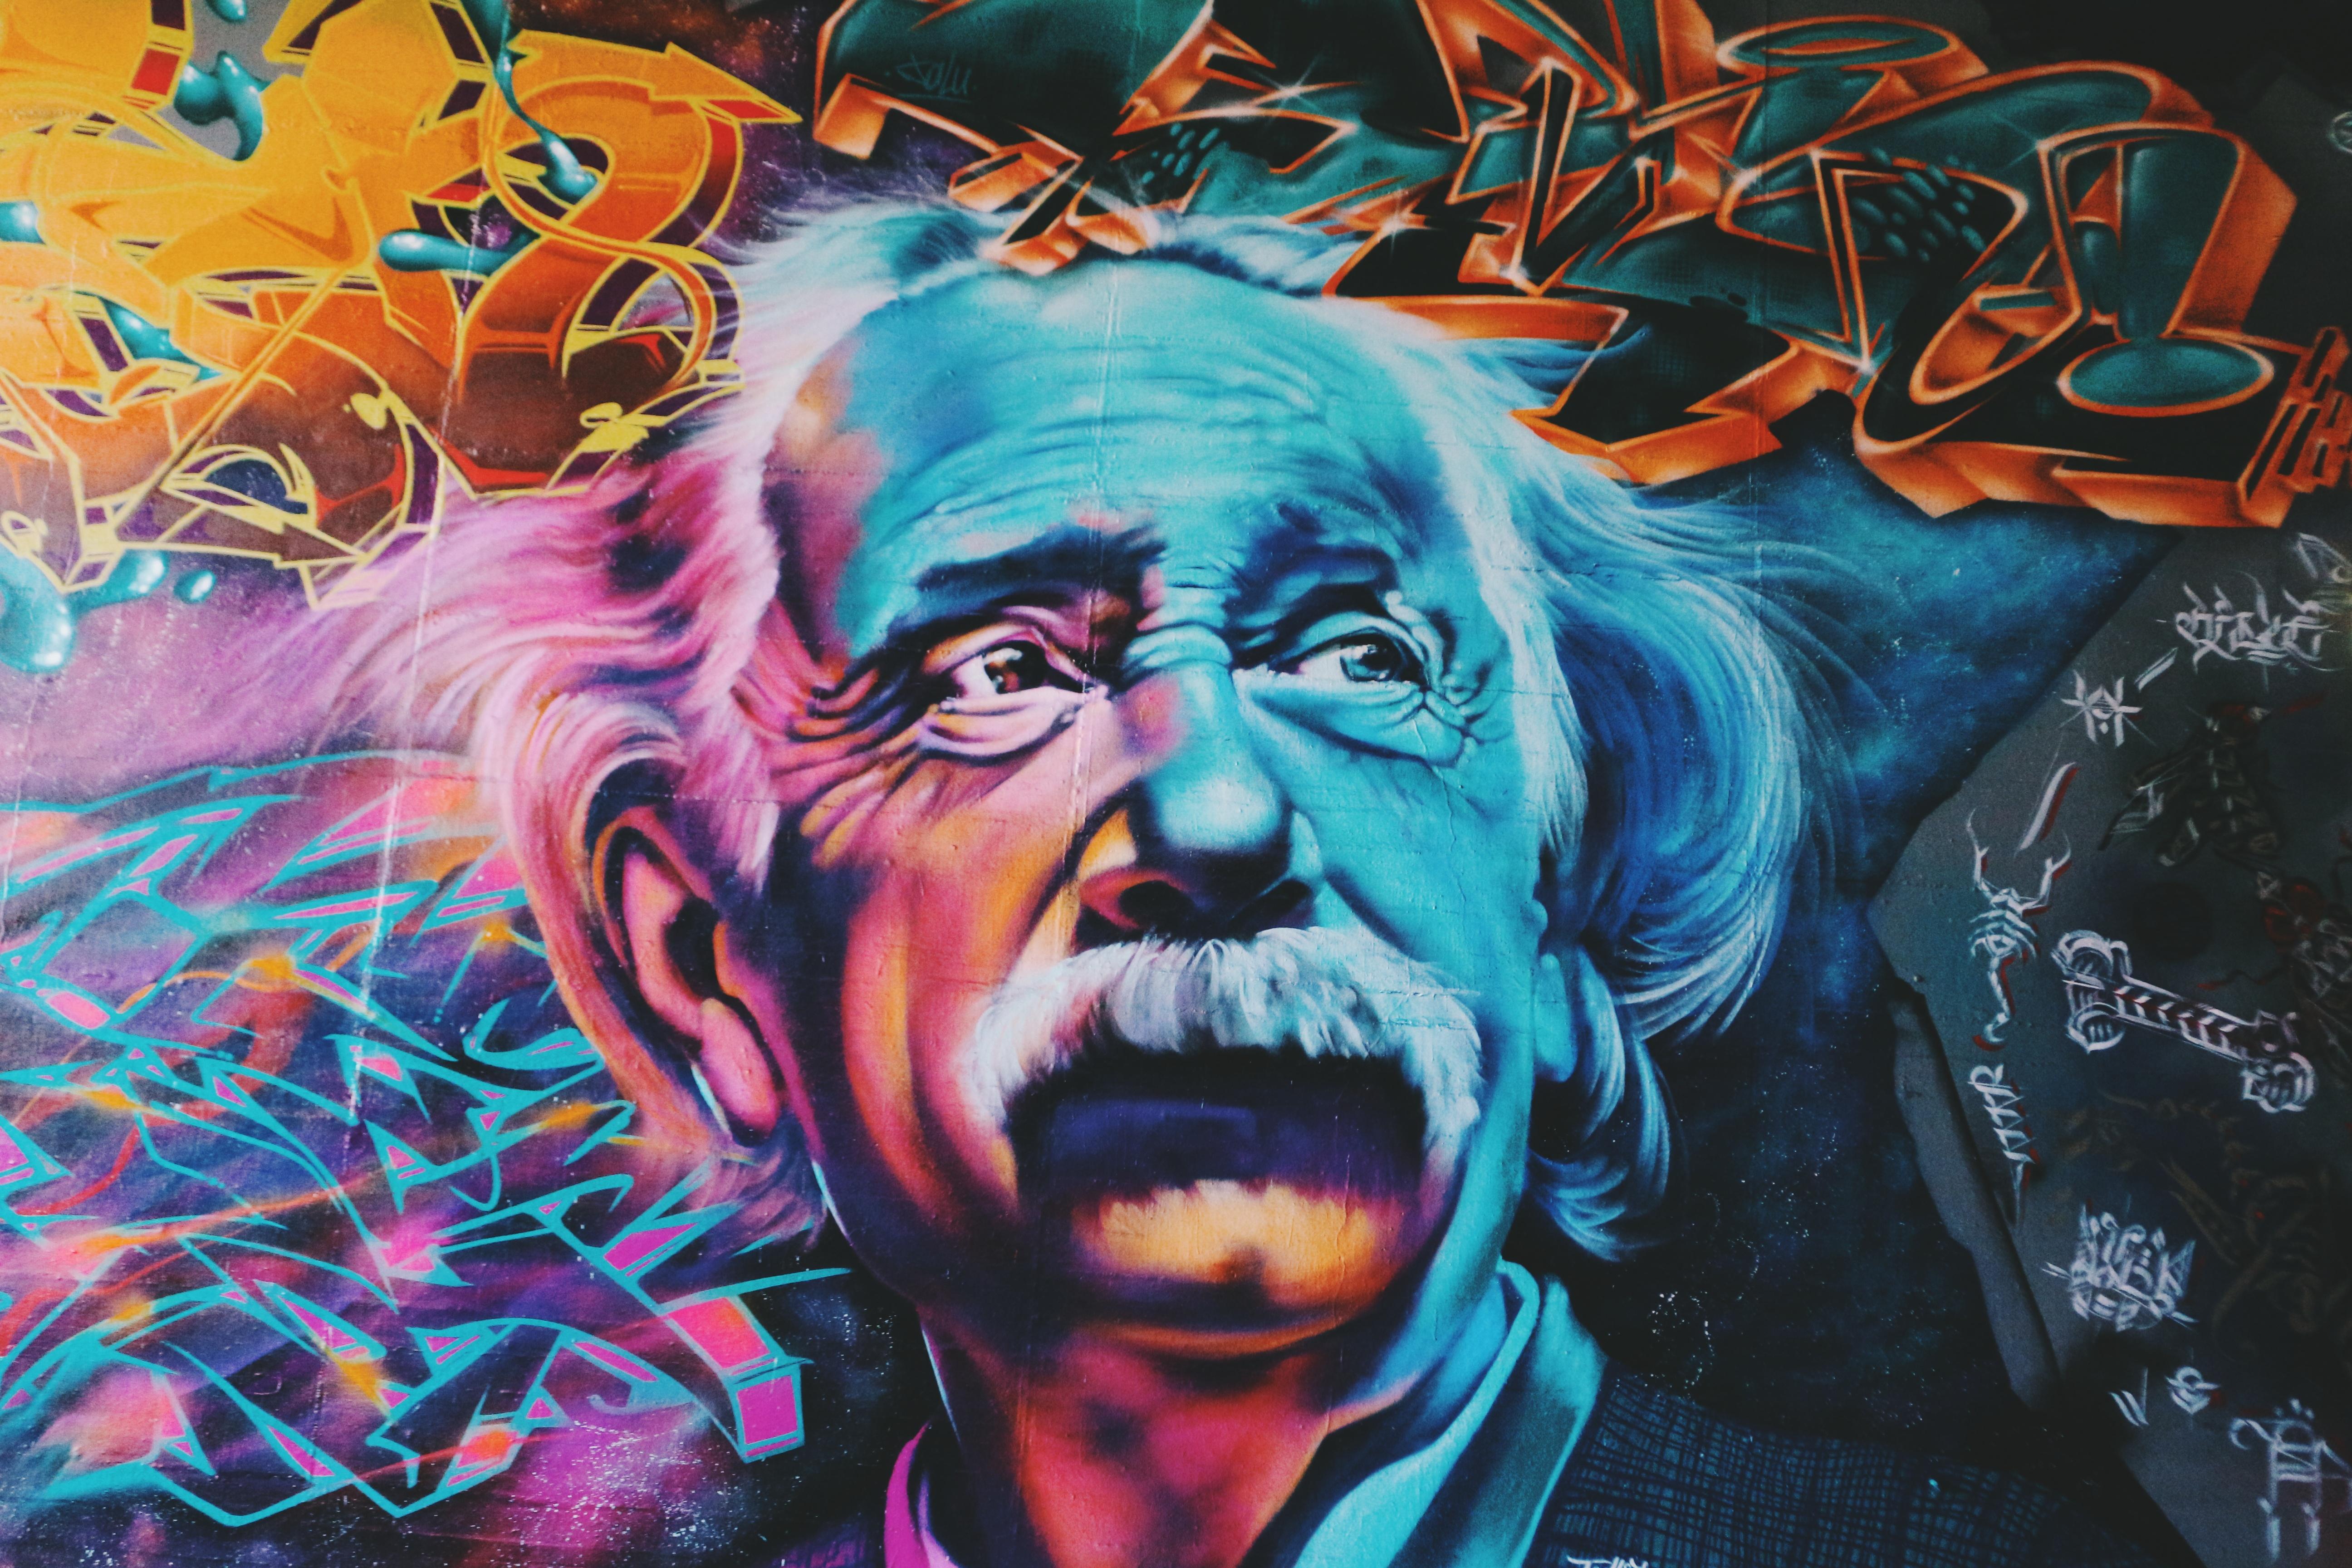 Albert einstein art colorful colourful graffiti wallpaper 5184x3456